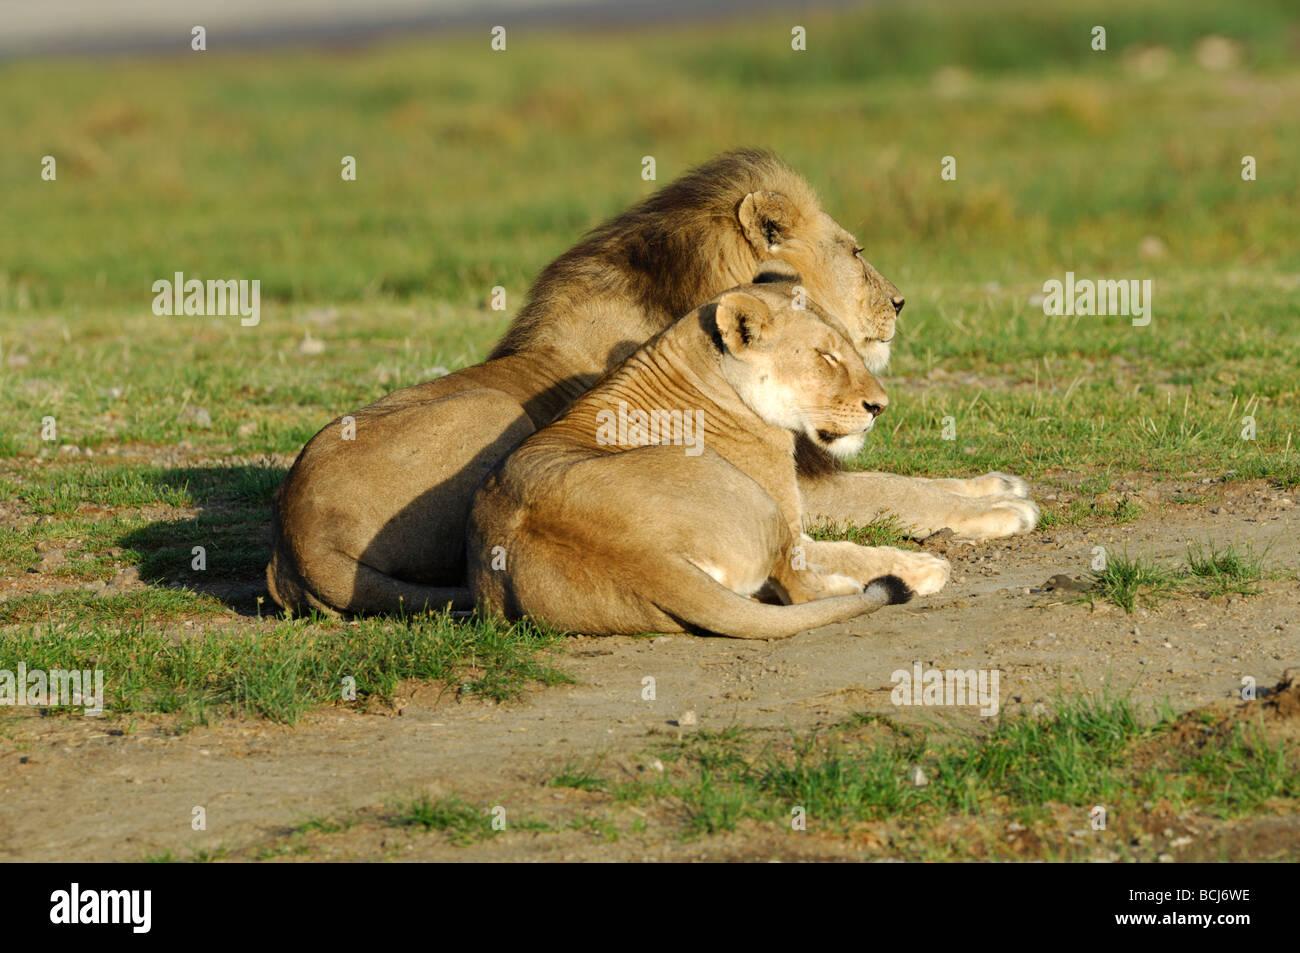 Stock photo of a male and female lion laying together, Ndutu, Ngorongoro Conservation Area, Tanzania, February 2009. - Stock Image